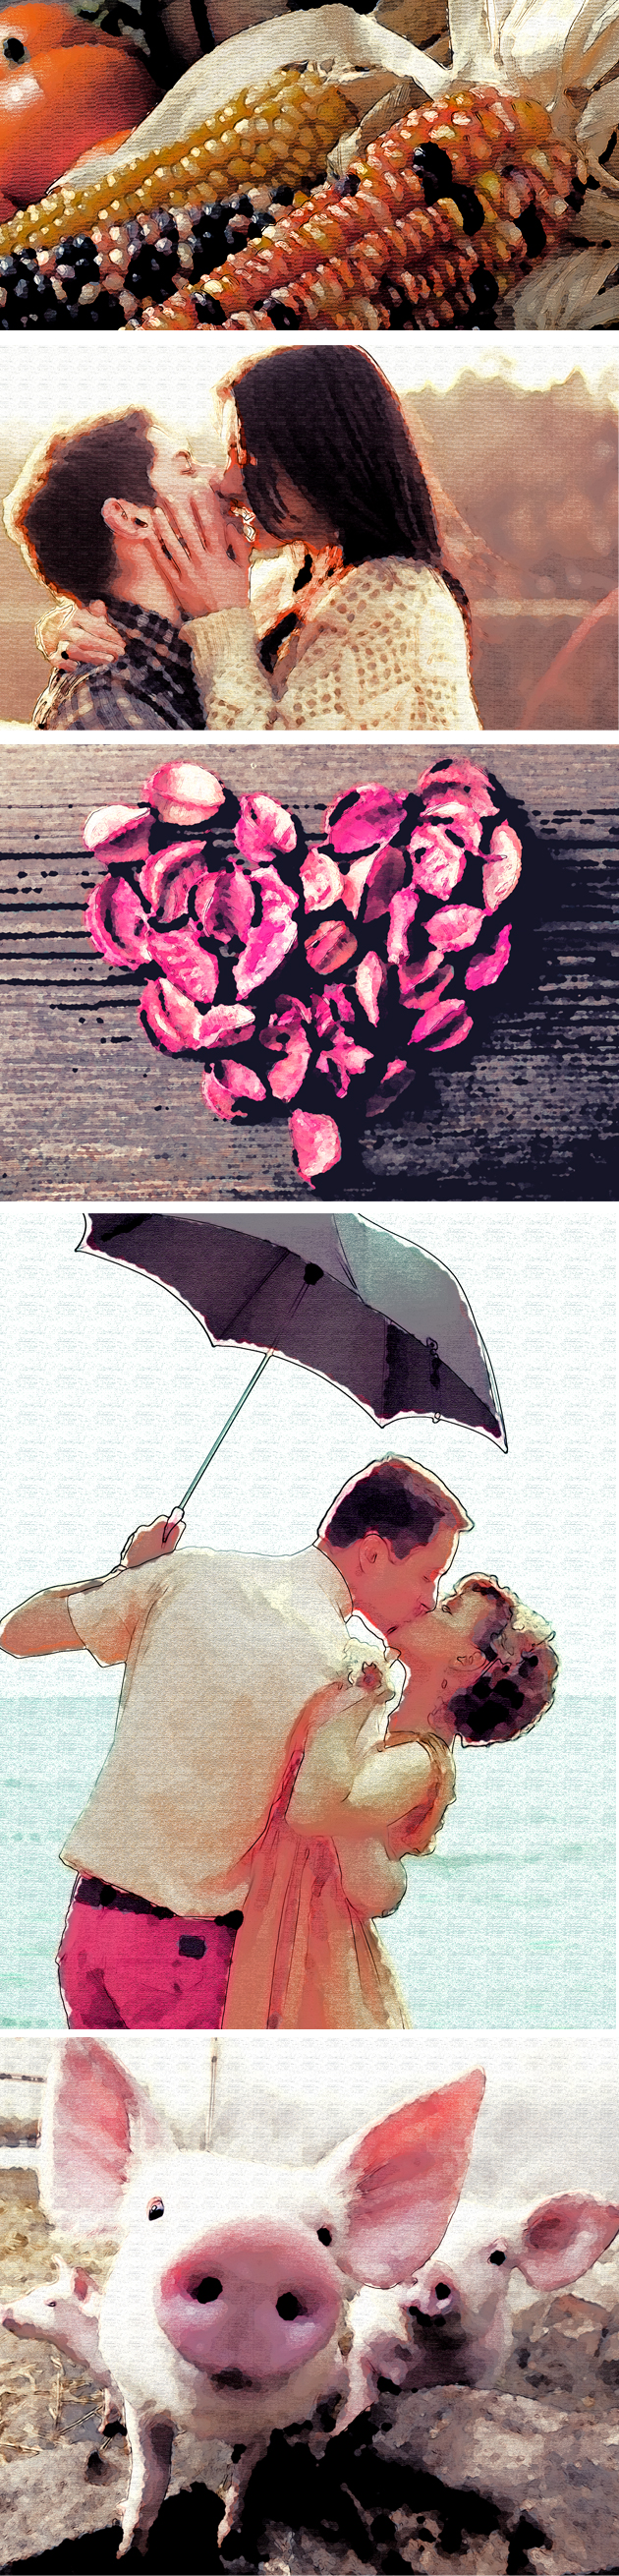 Sketch-Photo-Effect designtnt addons watercolor effect large